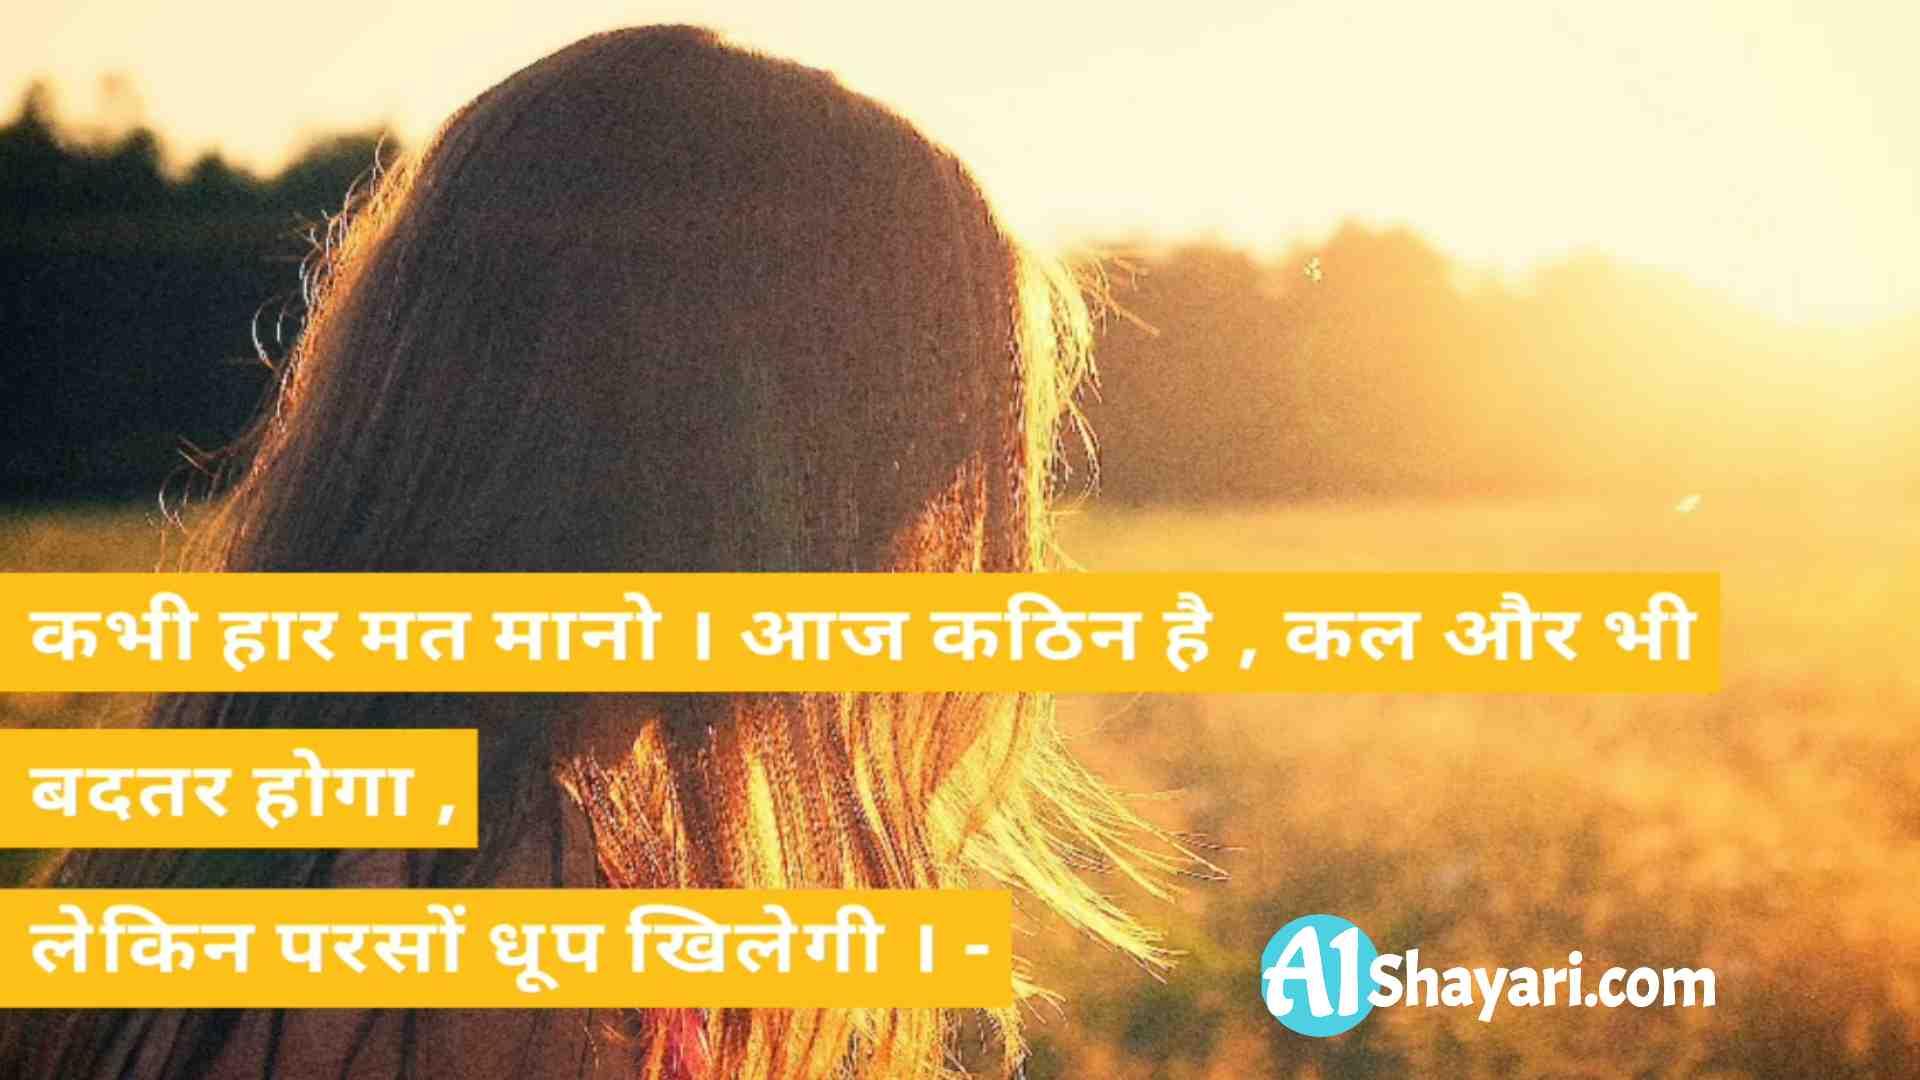 Ache Vichar Image In Hindi Download